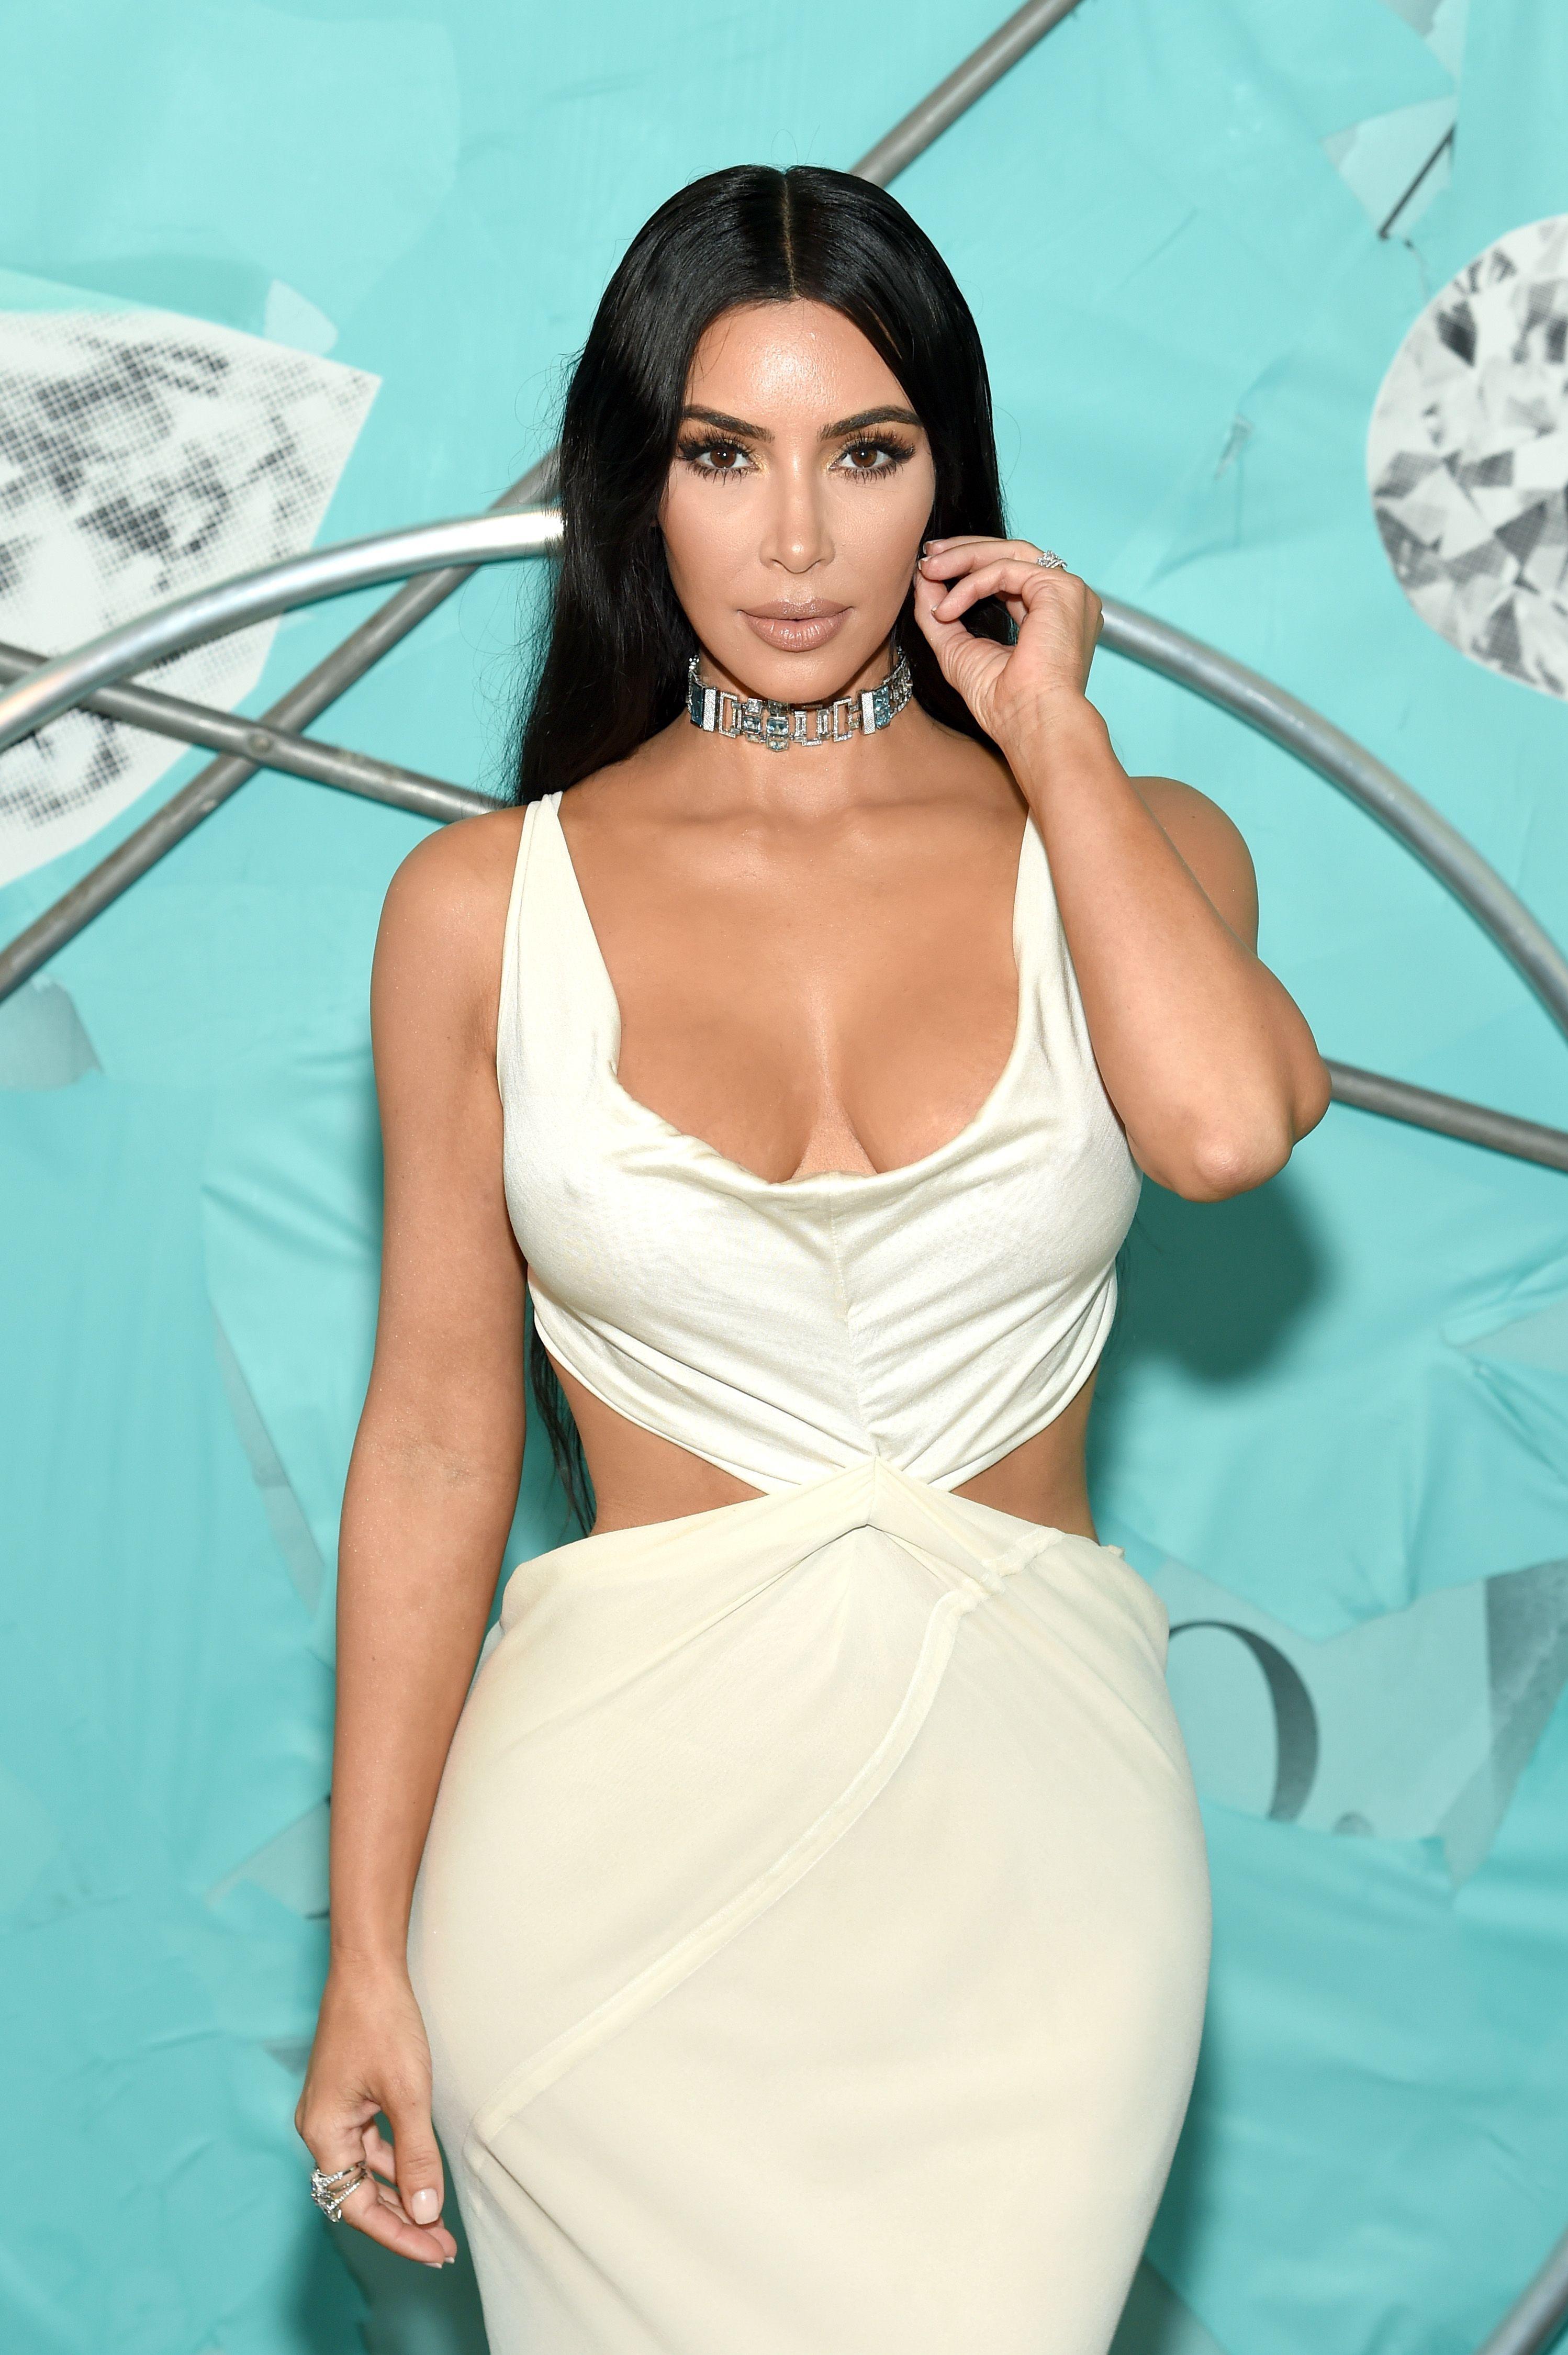 Kim Kardashian Shows Off Five Additional Fridges Following Restaurant-Size Kitchen Video